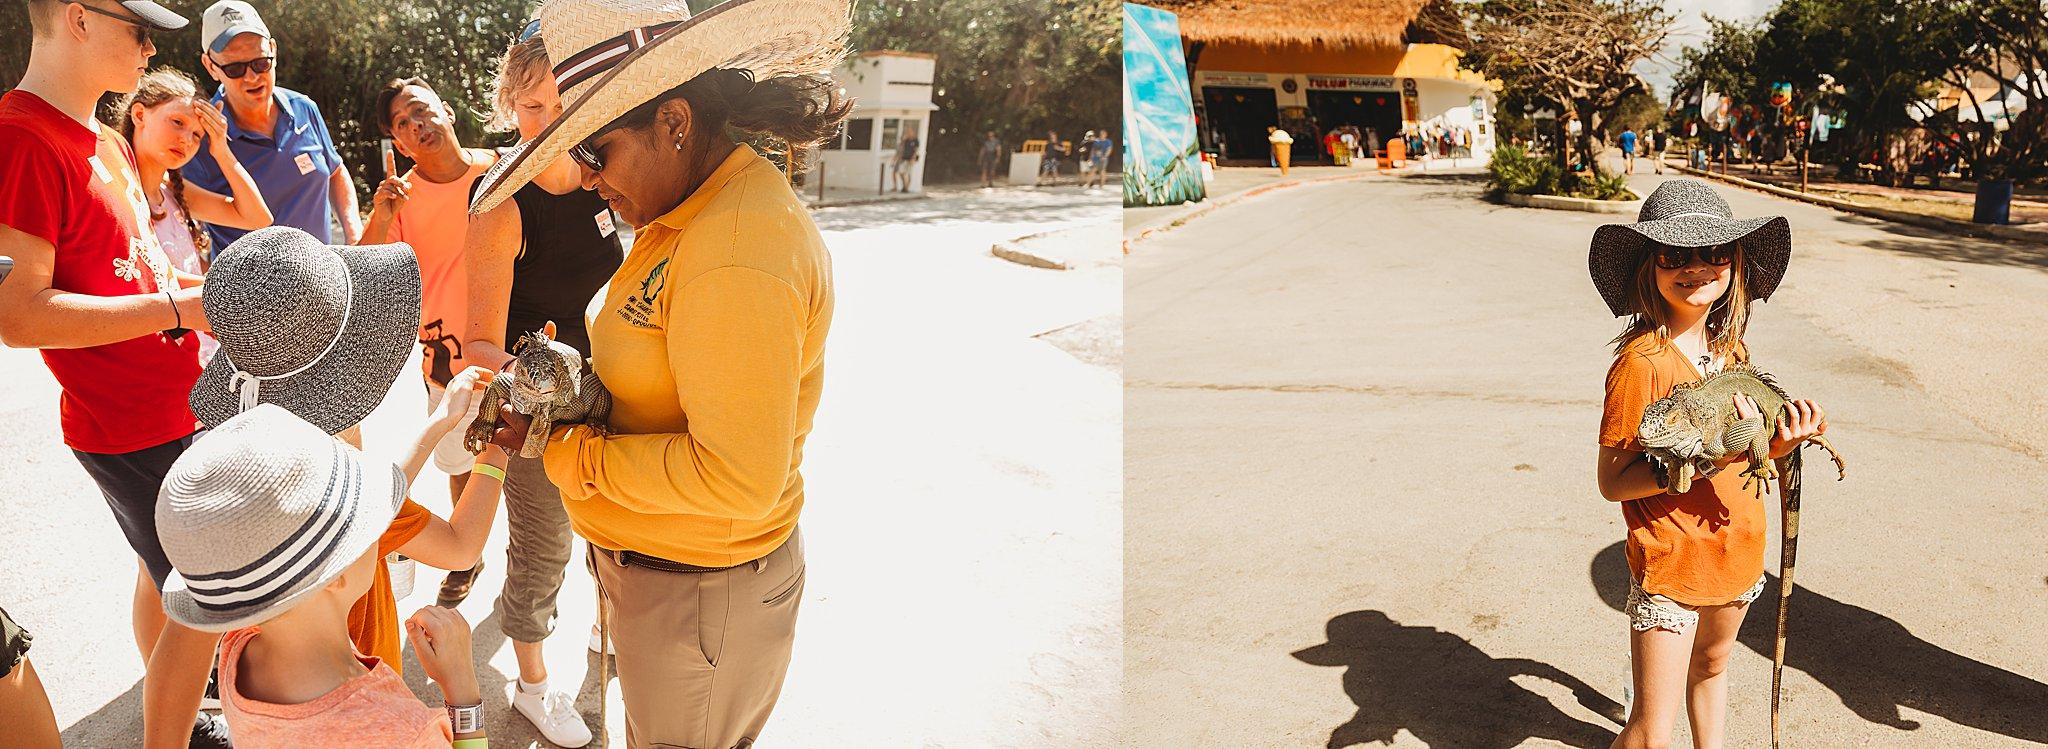 Mexico Vacation 2019 Anna Hurley Photography 57.jpg